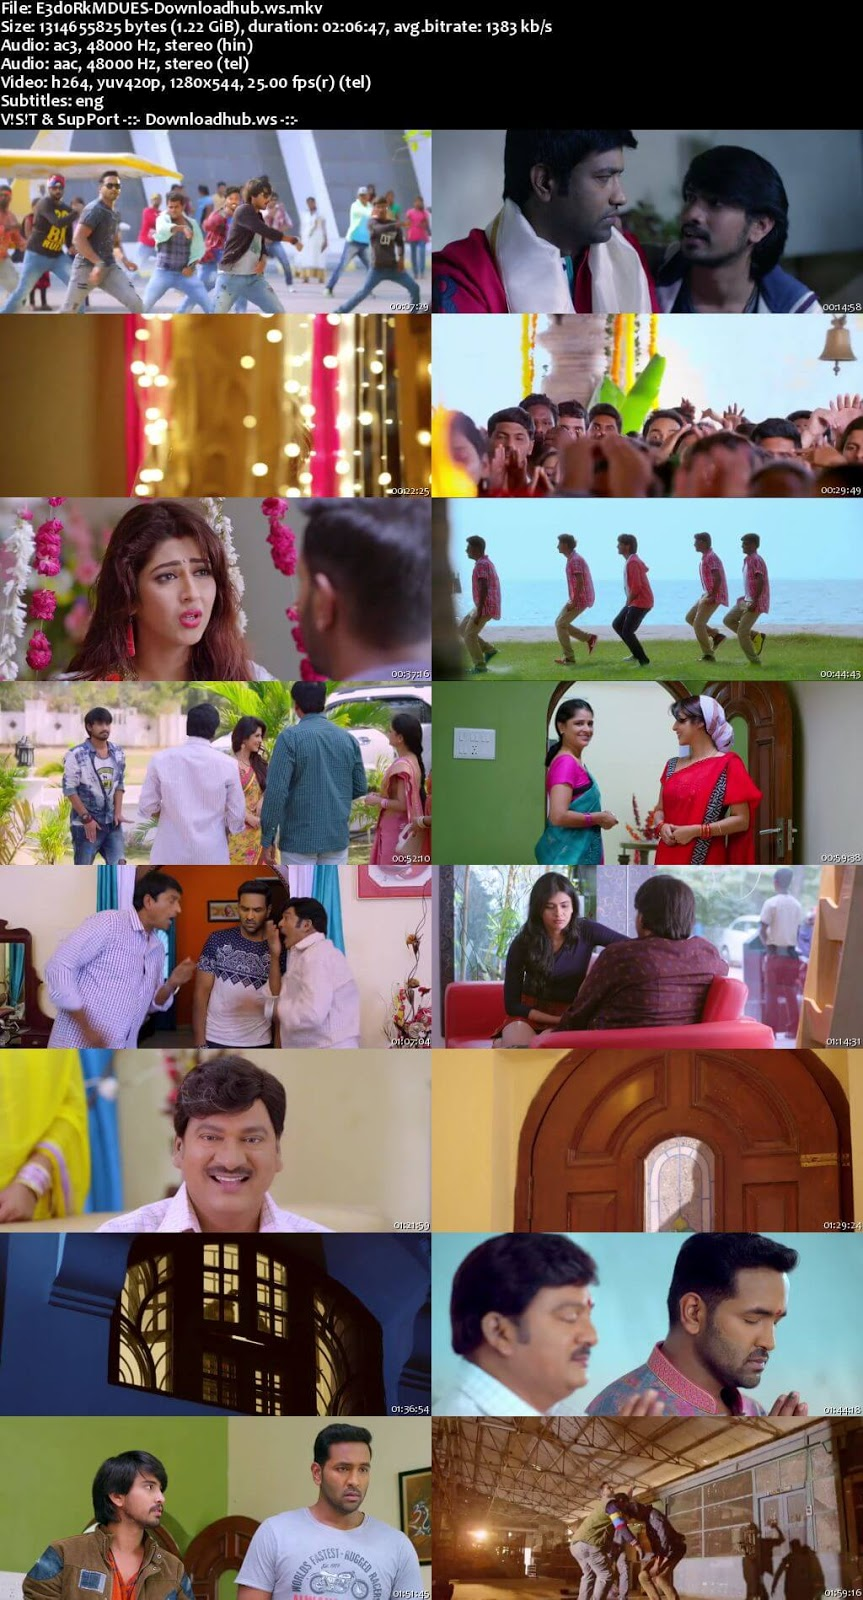 Eedo Rakam Aado Rakam 2016 UNCUT Hindi Dual Audio 720p HDRip Free Download